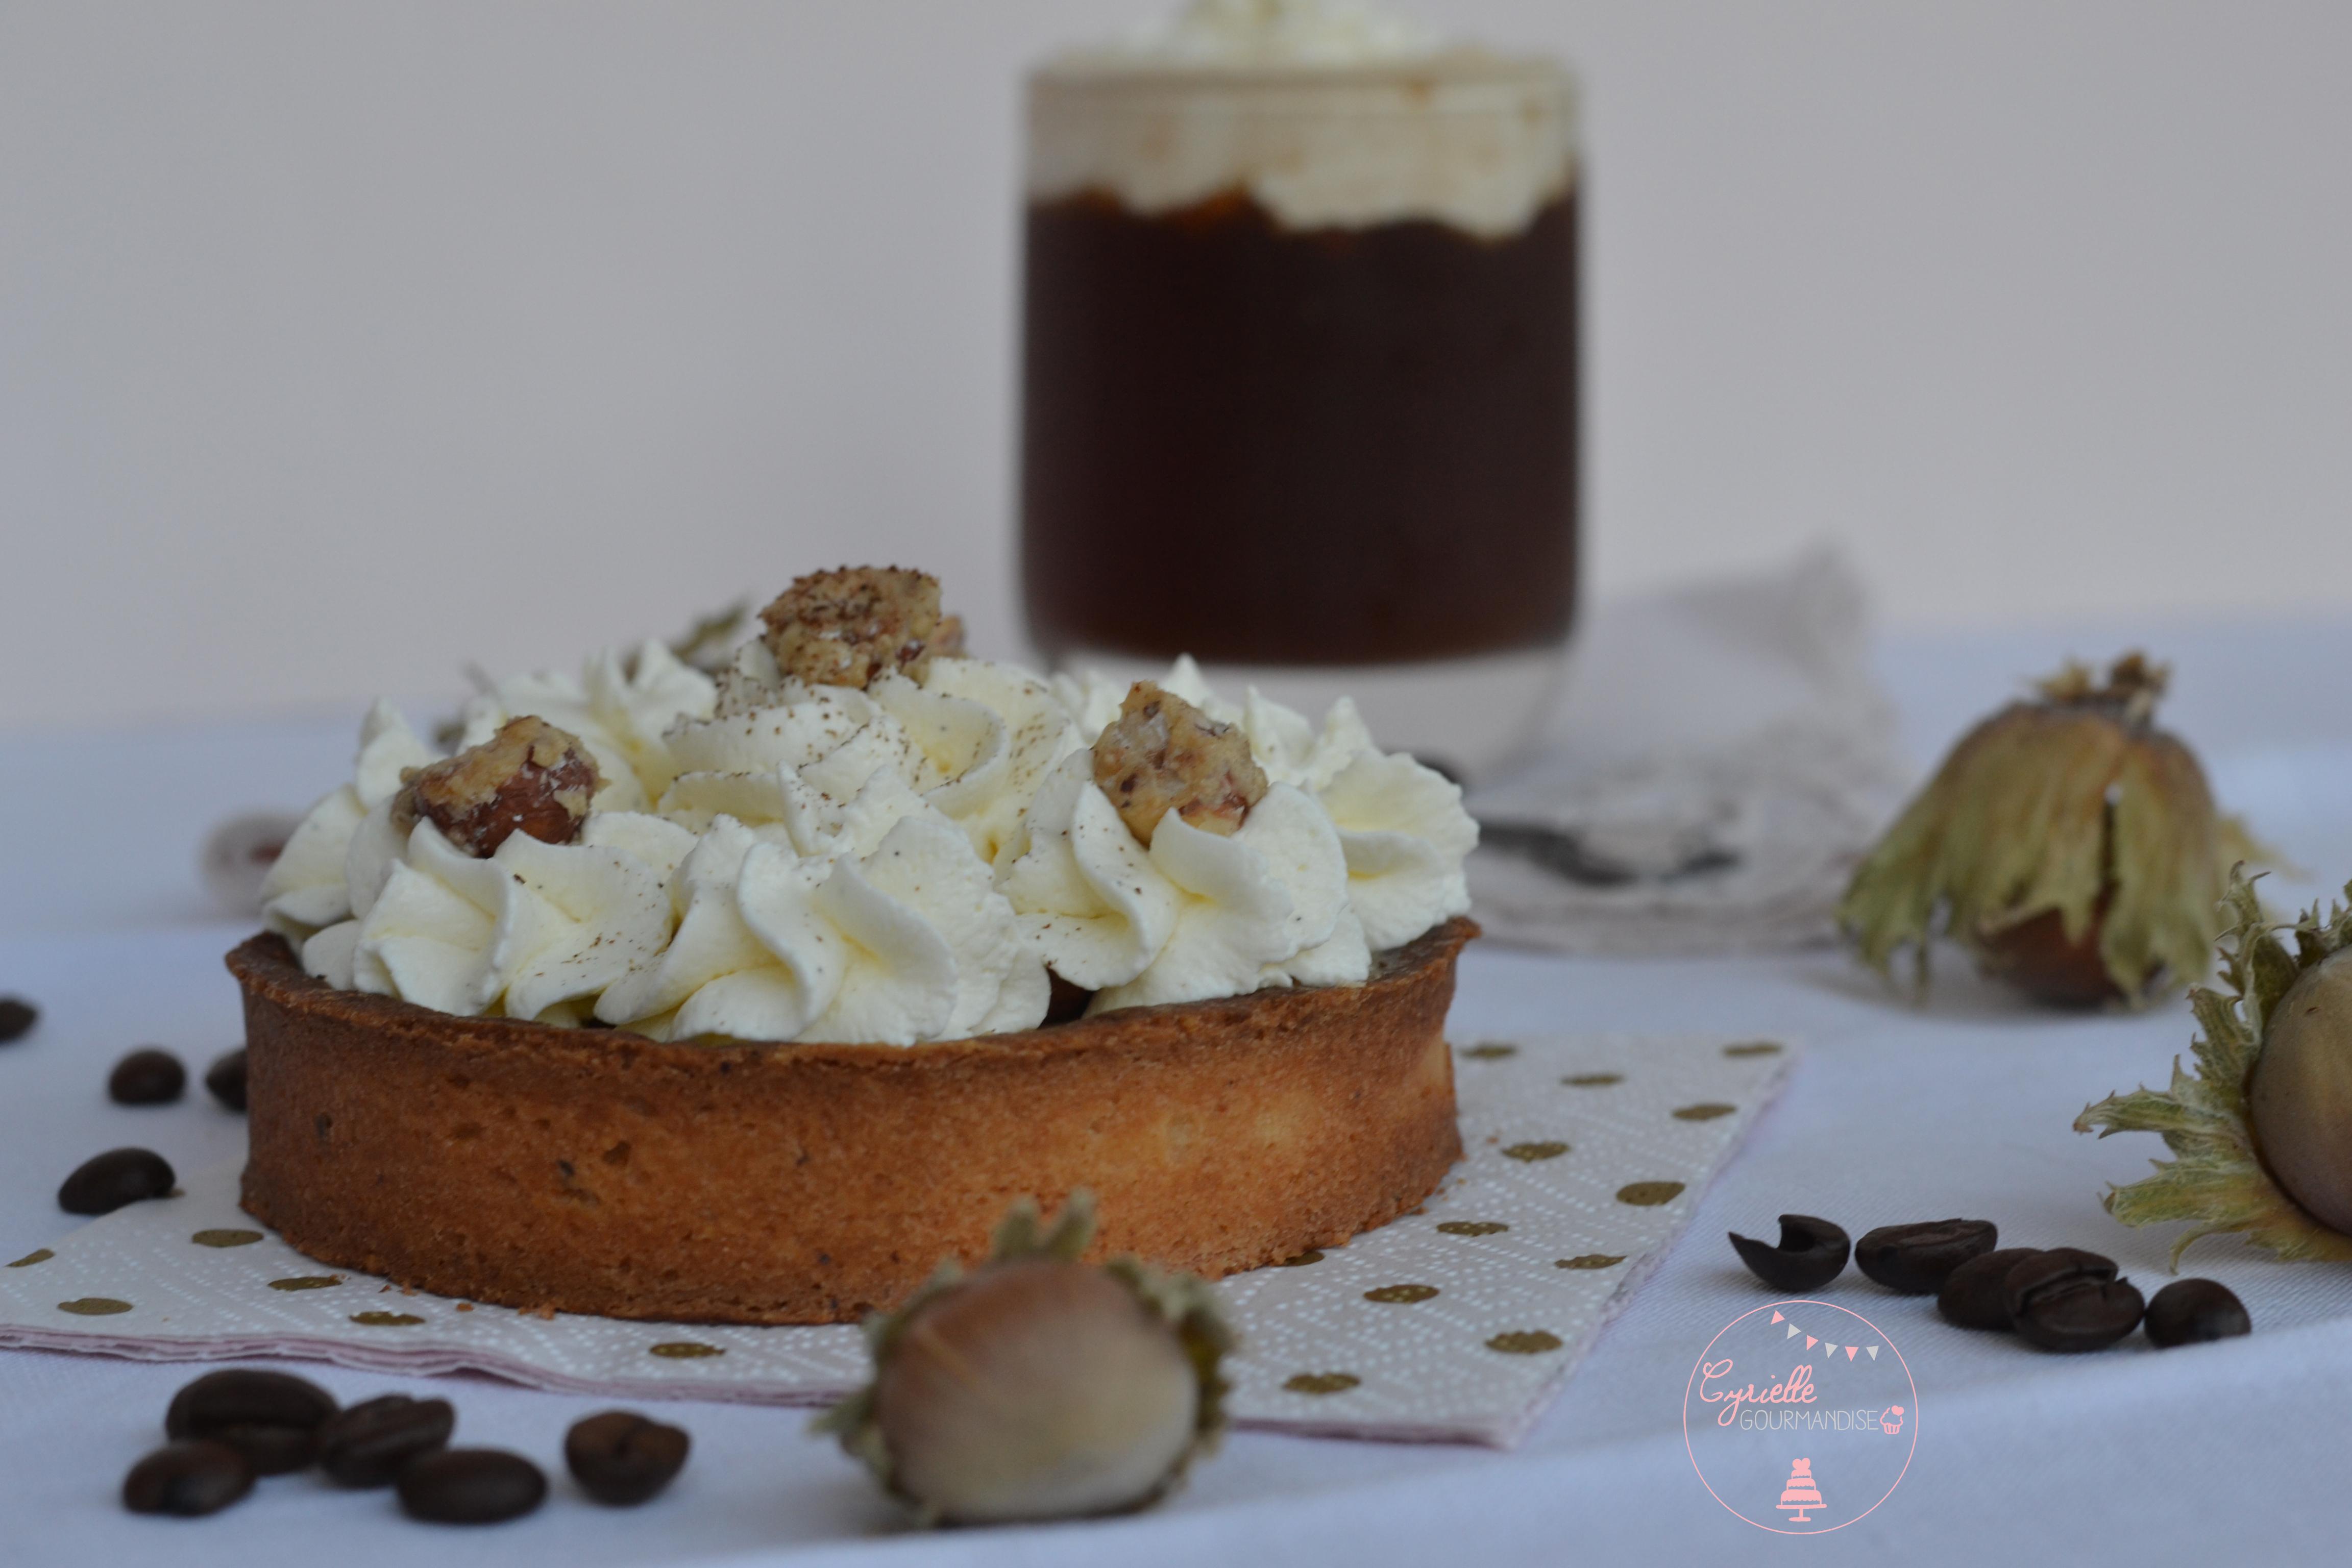 Tarte café noisette Gourmesso 4